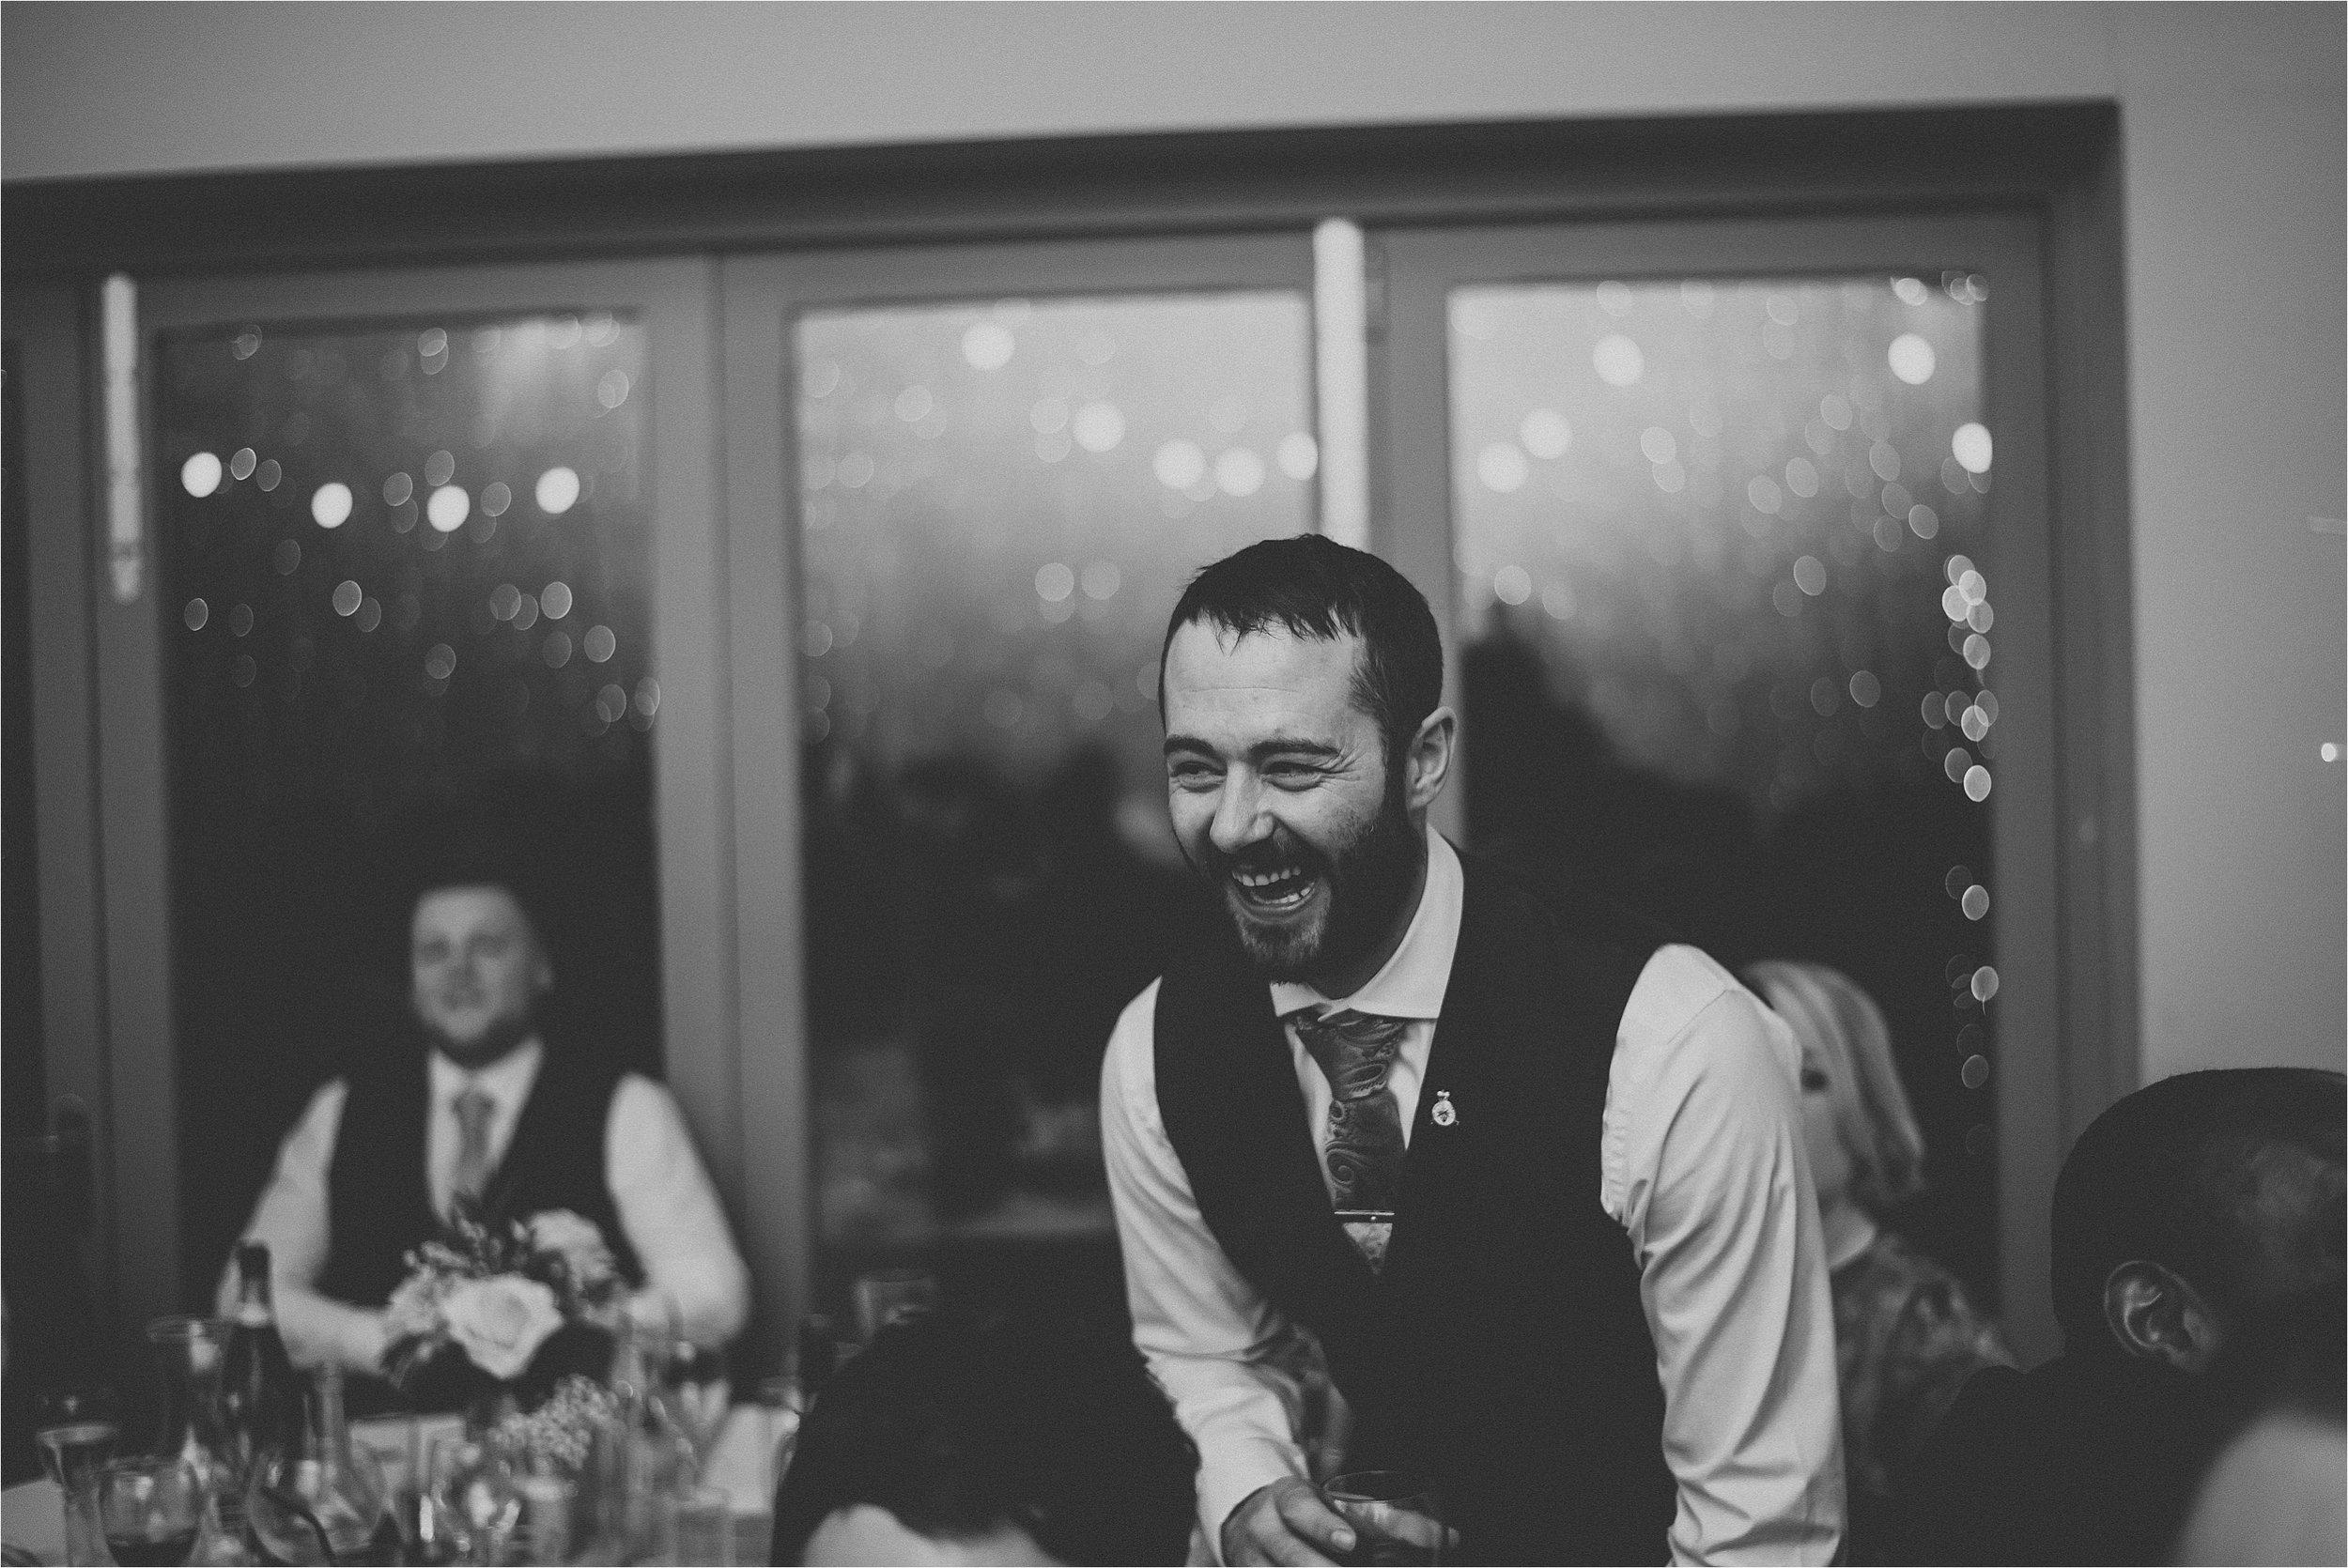 man laughing at wedding party